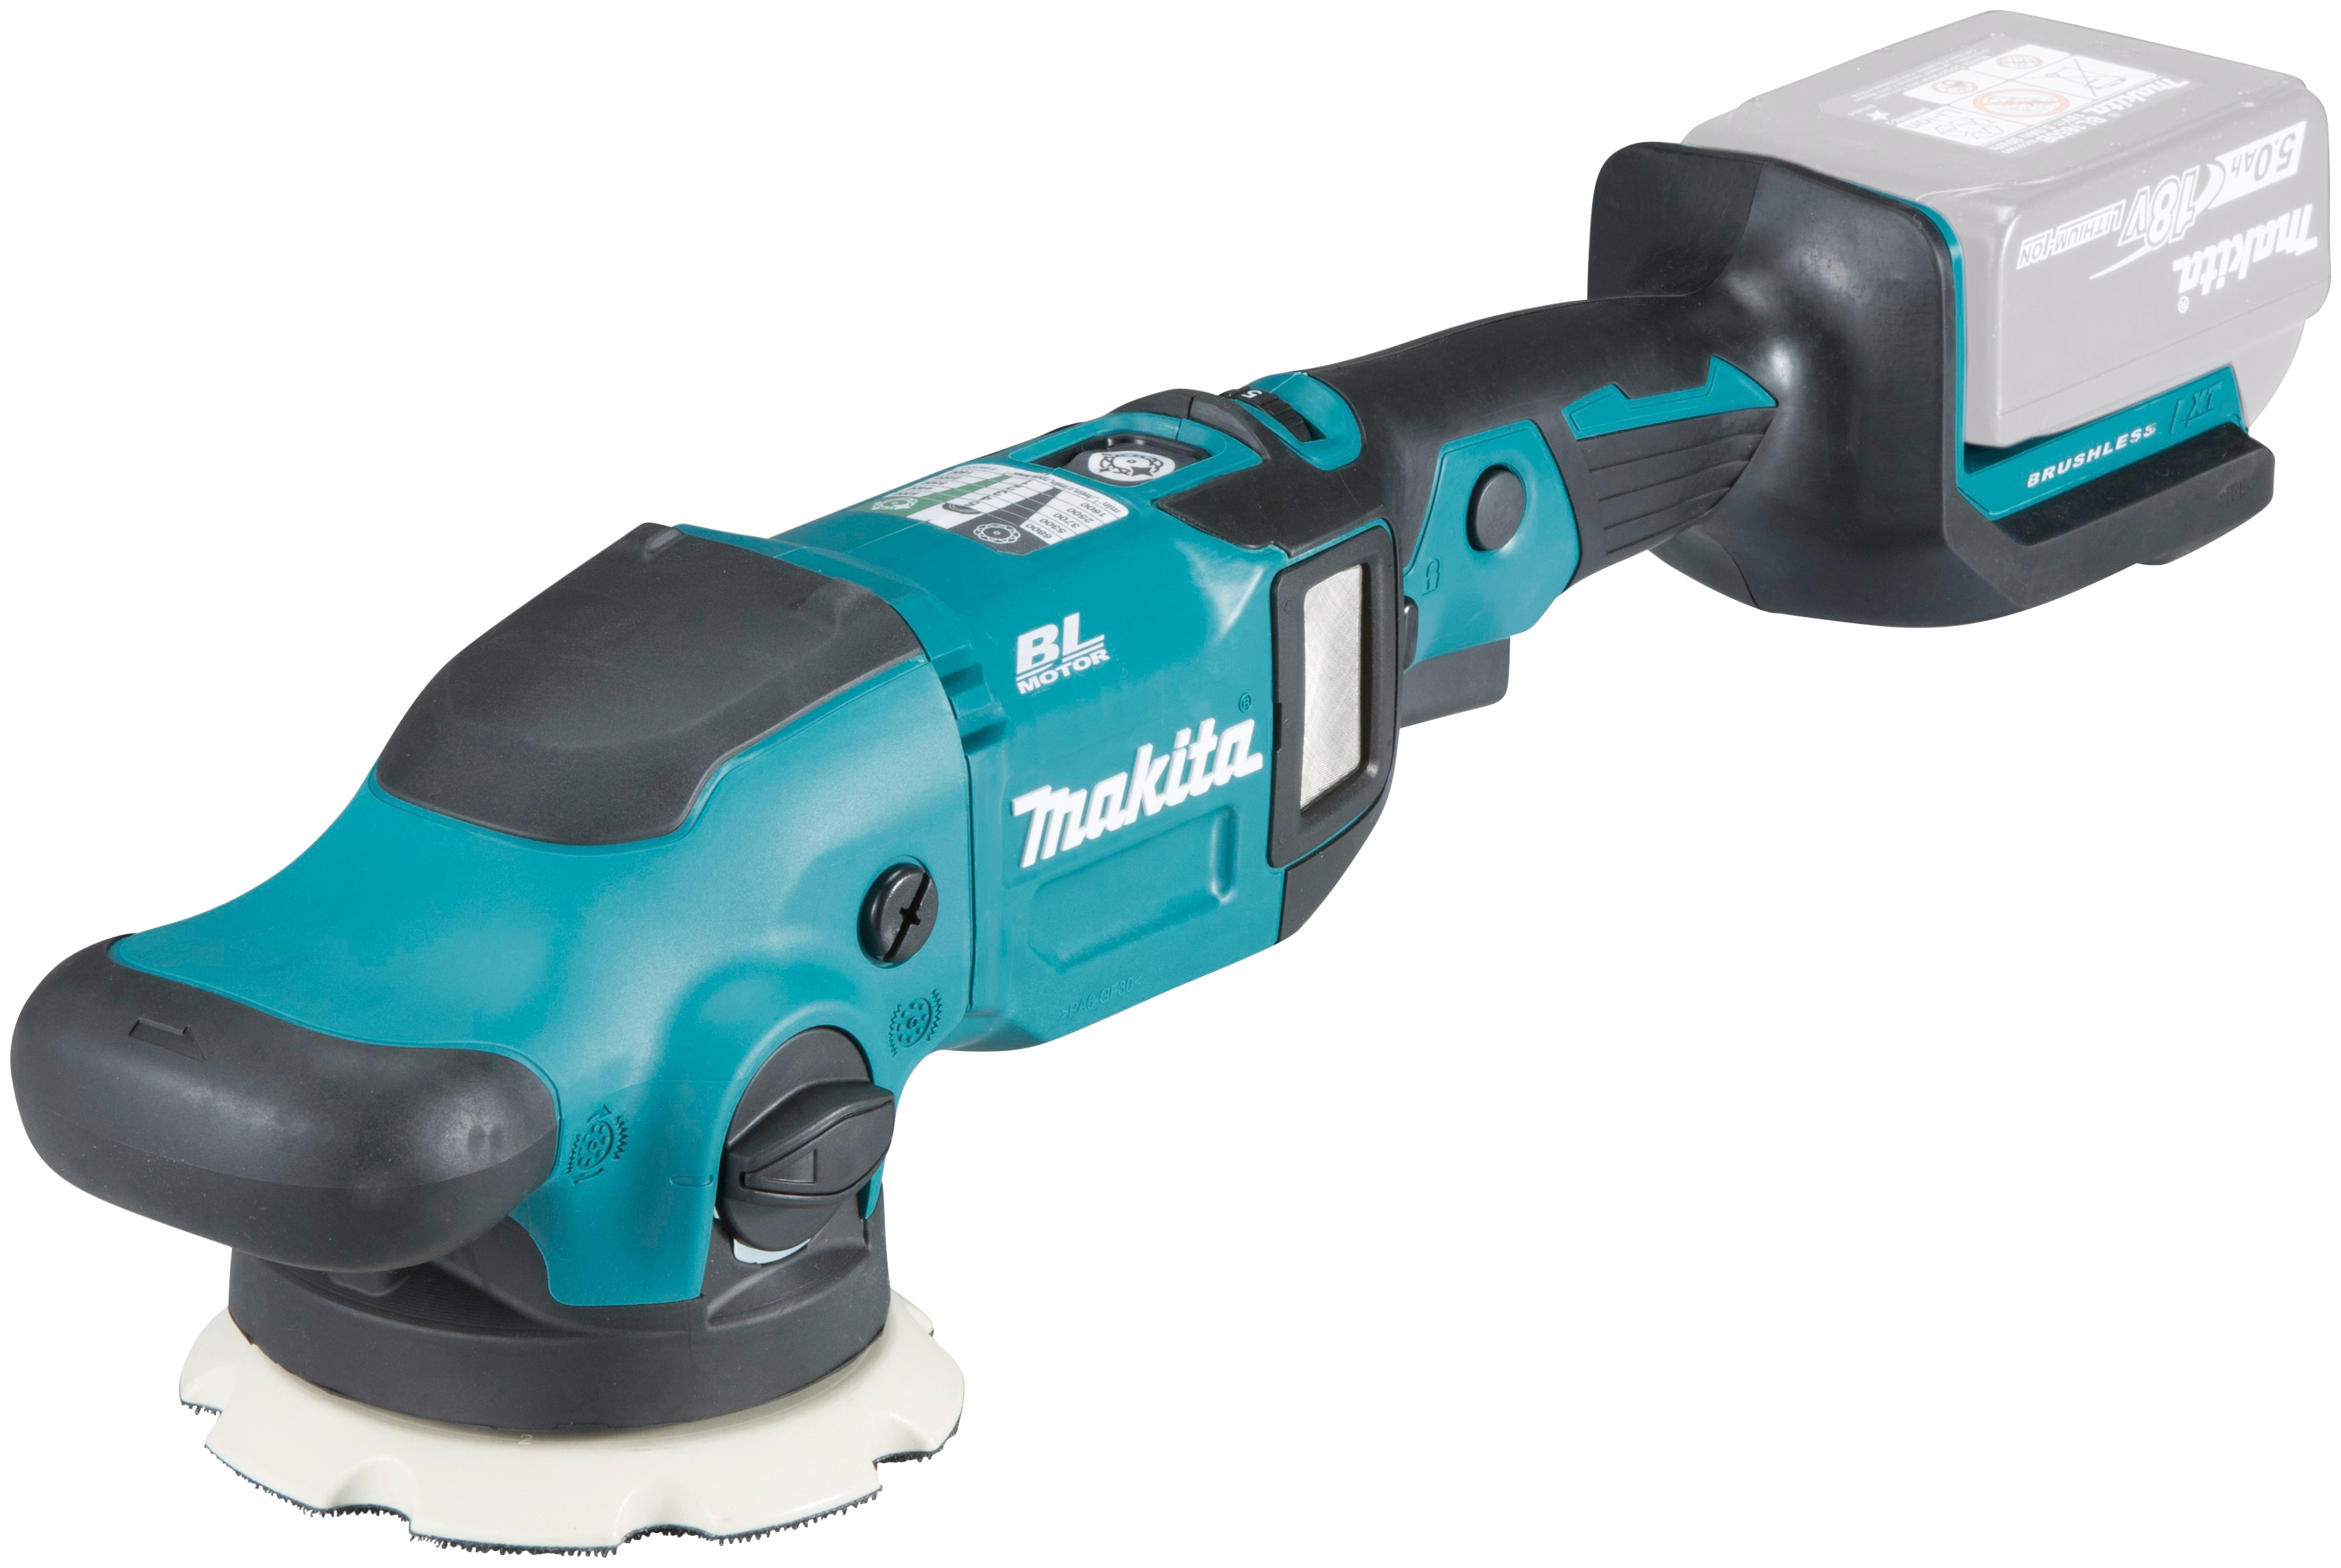 Makita Akku-Poliermaschine DPO500Z, 18 V, speziell zur Auto-Politur entwickelt grün Profi-Werkzeug Werkzeug Maschinen